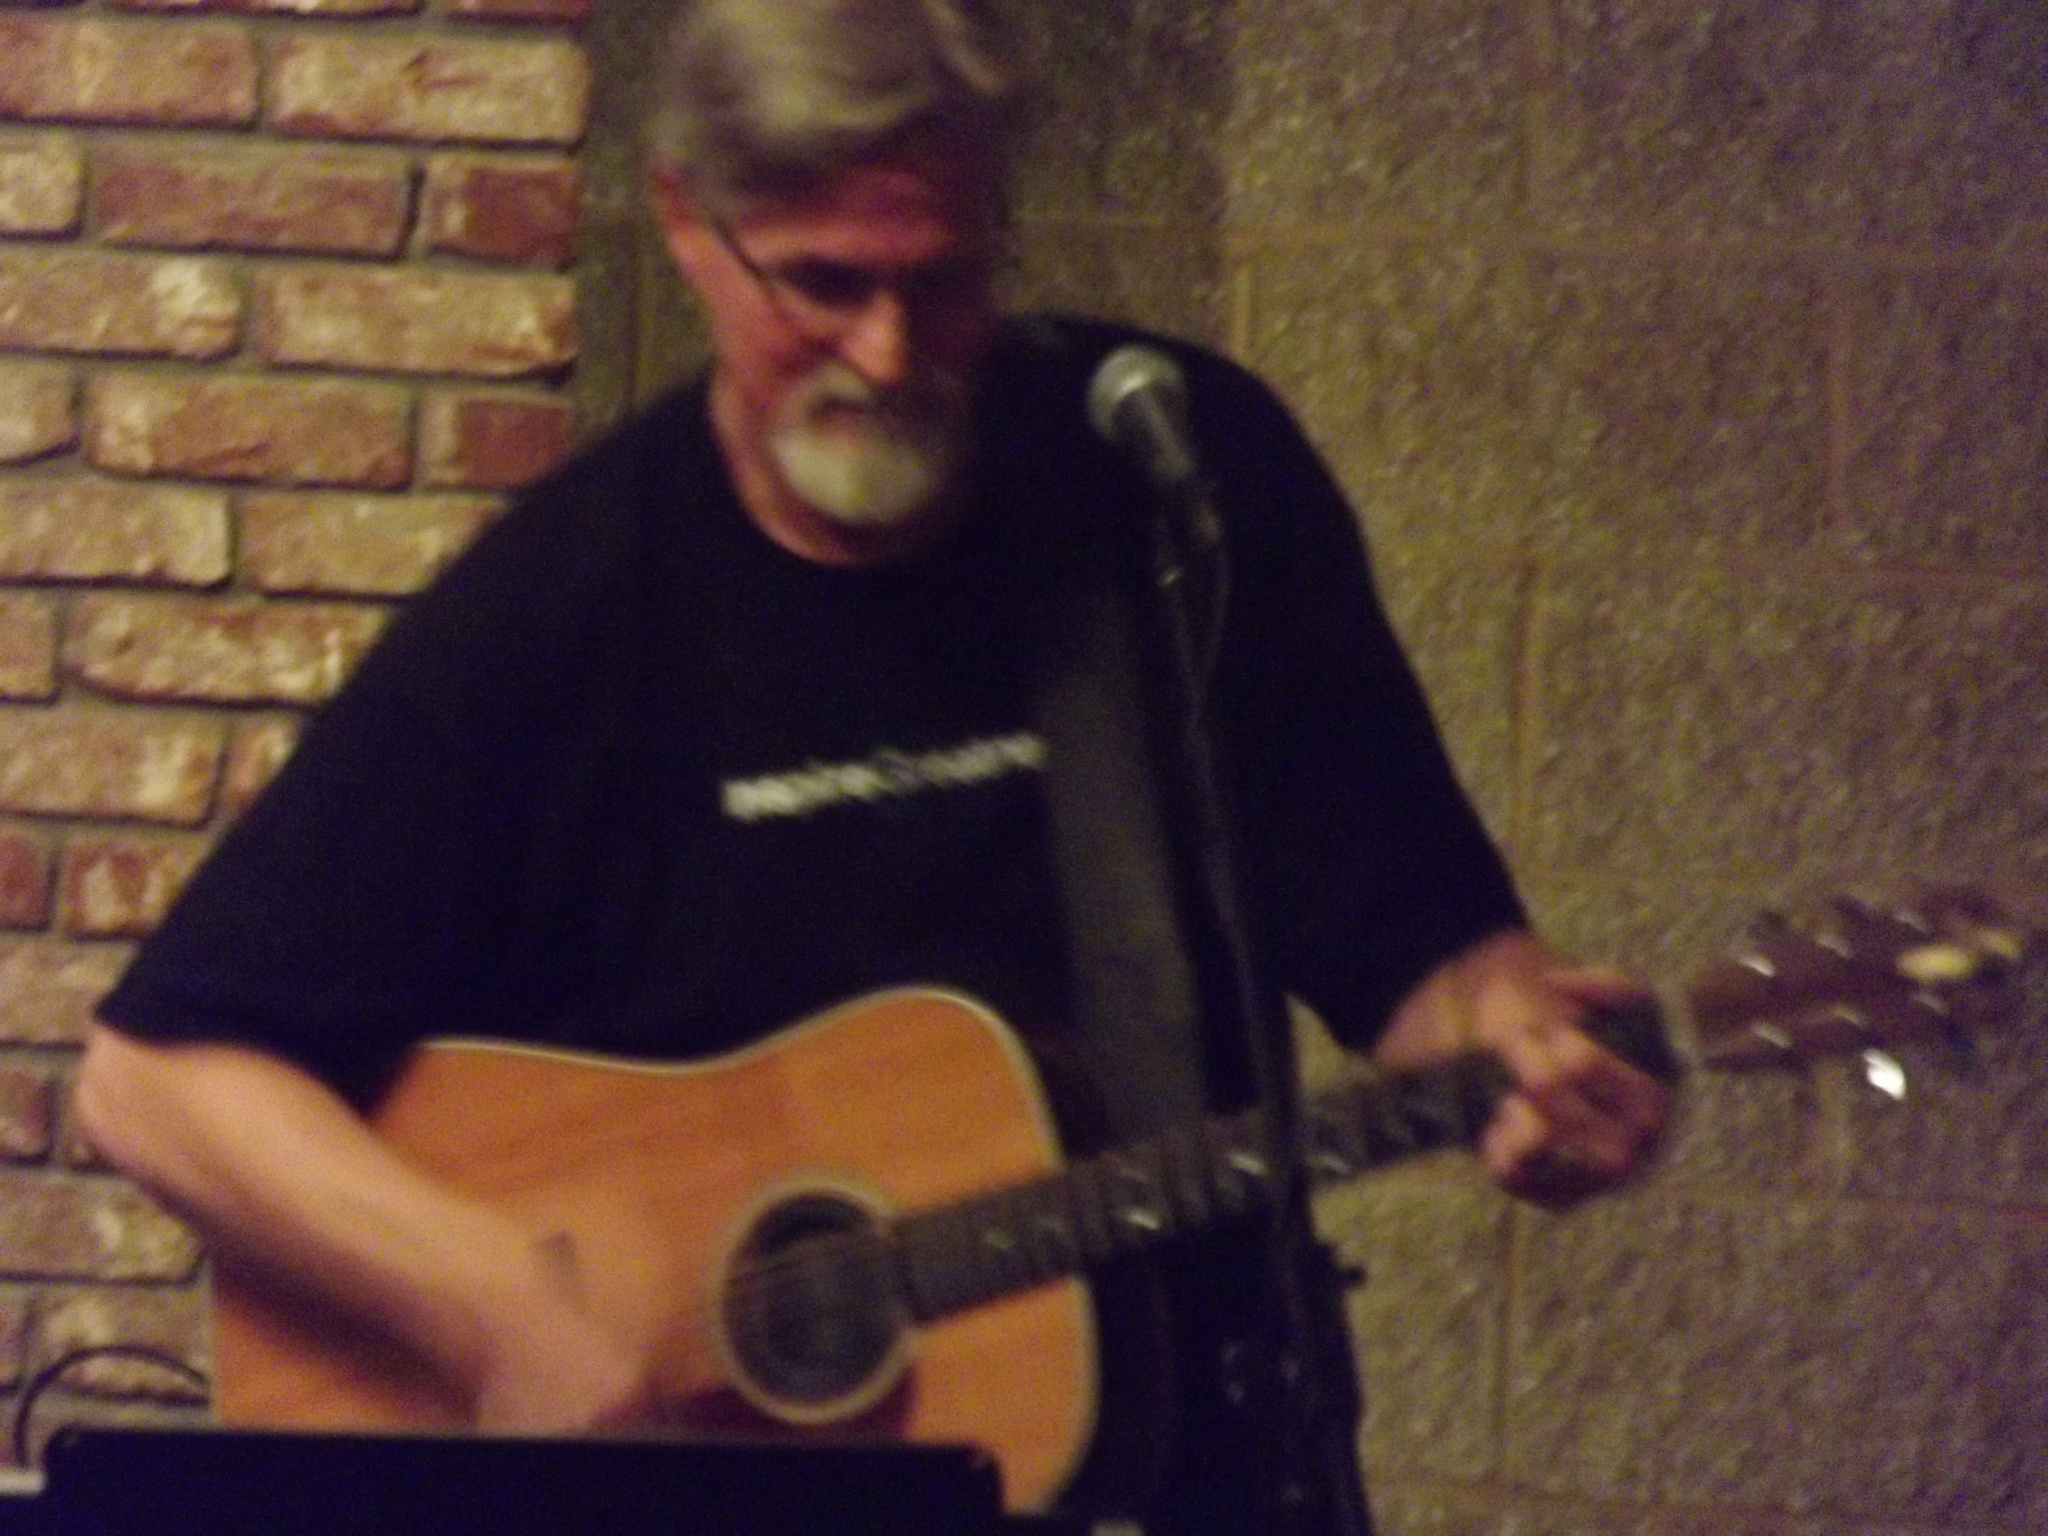 Mr. Dennis Weller. Good friend. Great guitarist and a true Doobie Brothers fan. Keep that Long Train Running brother.